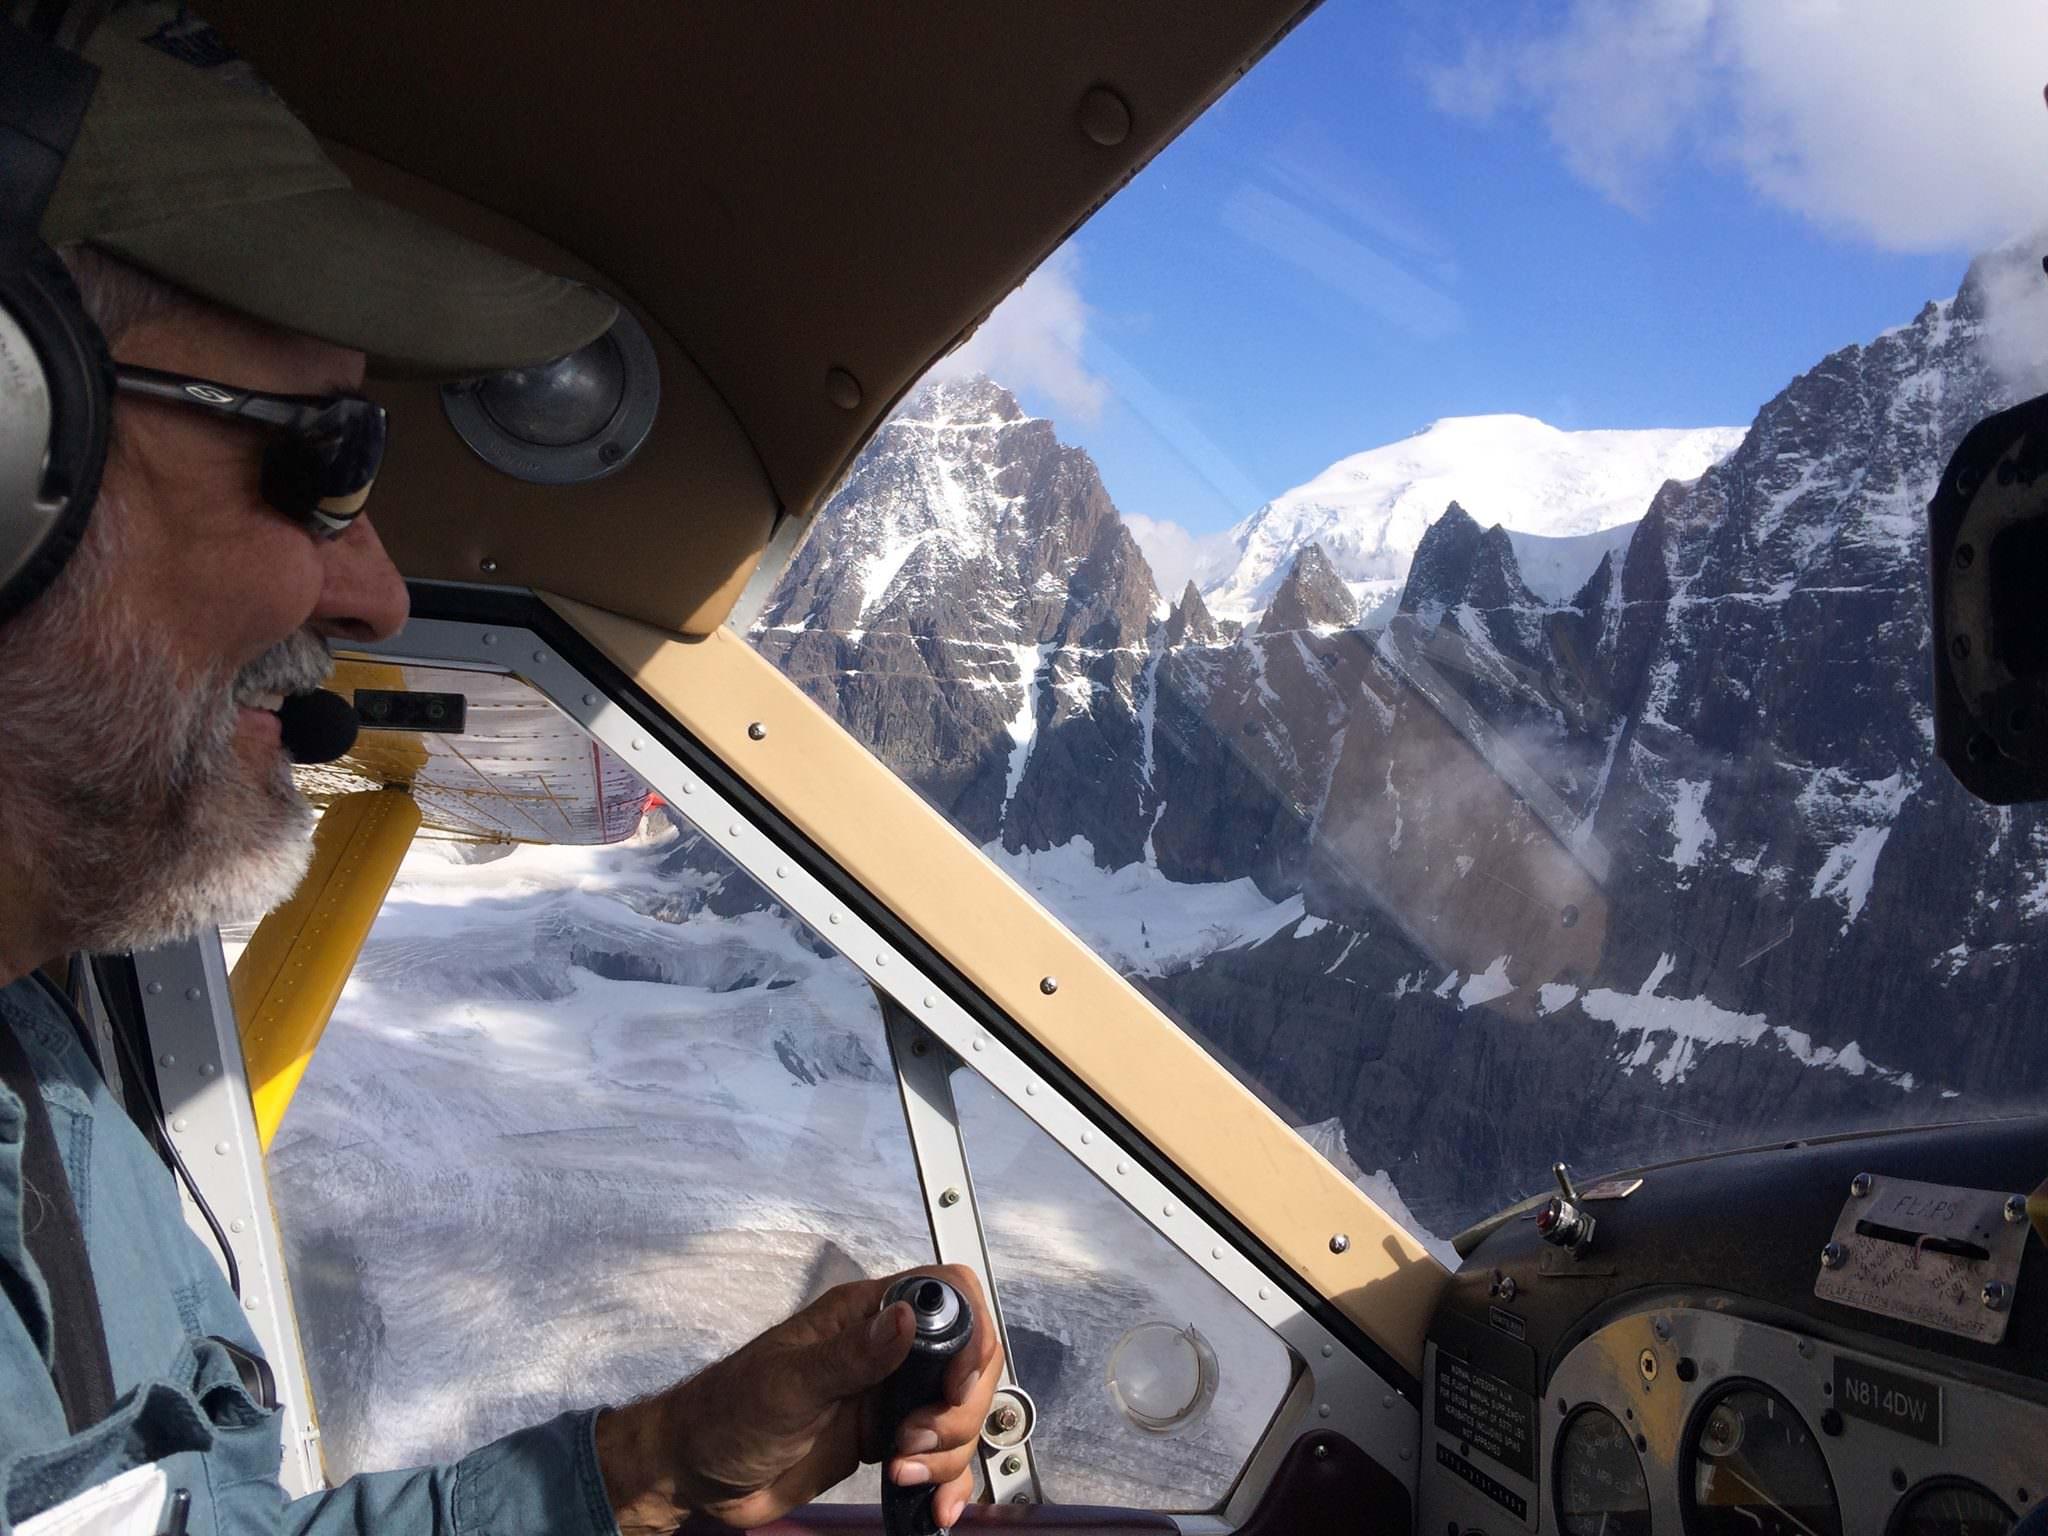 Wrangell Mountain Air founder, Kelly Bay flies the DeHavilland Beaver around Castle Peak.